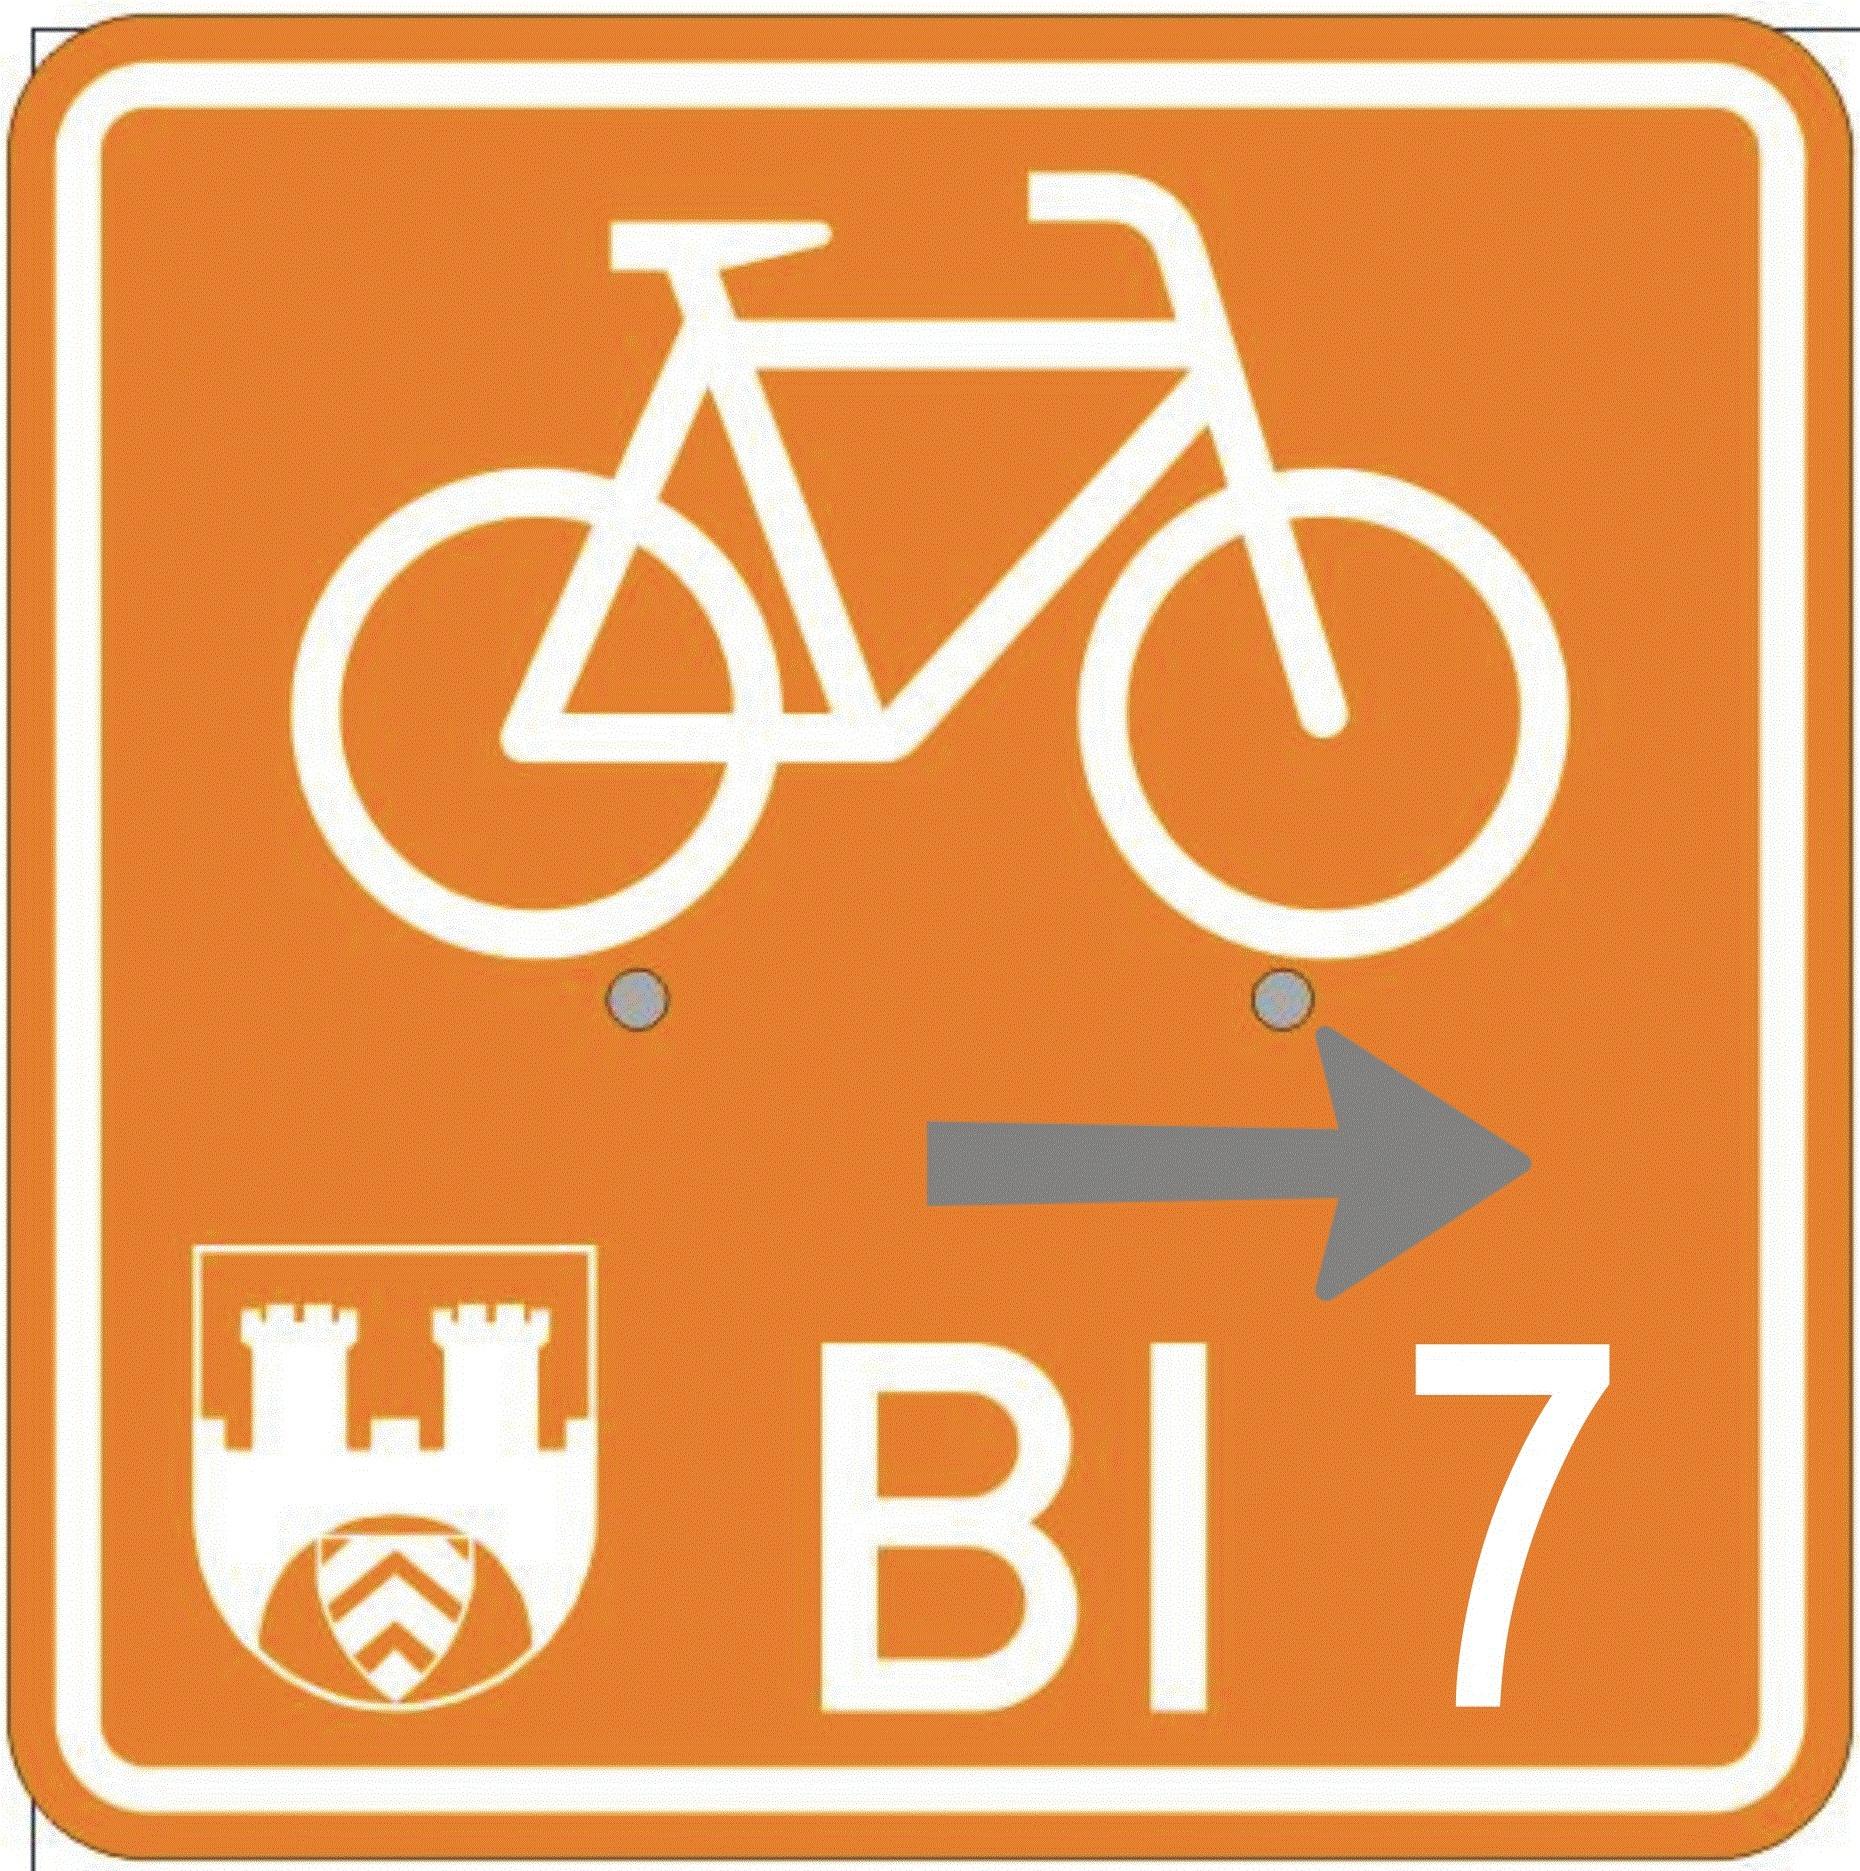 BI 7 Sennestadt